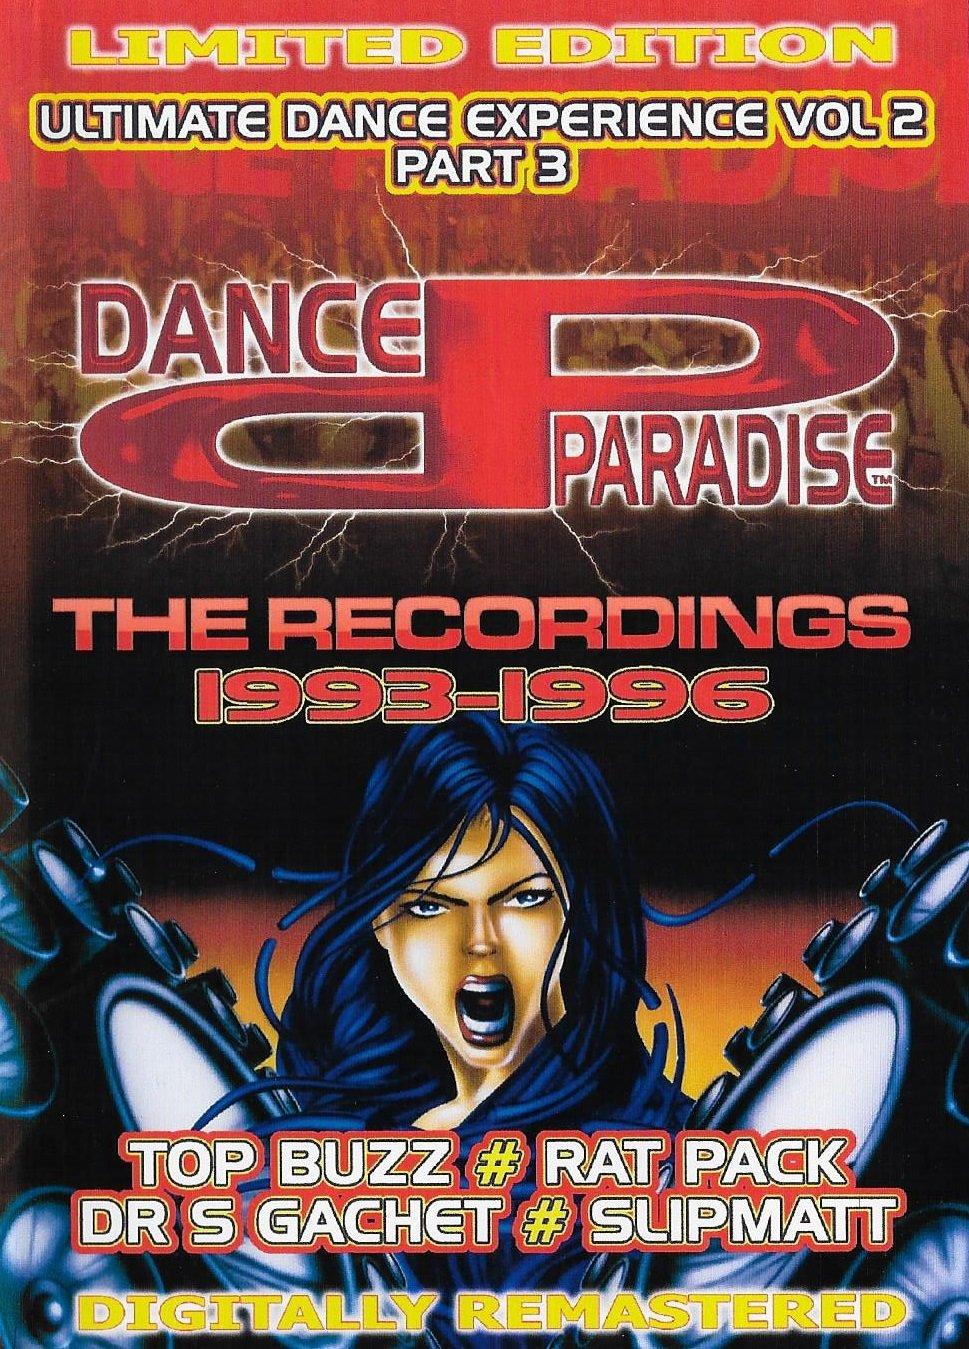 Dance Paradise - The Recordings 1993-1996 - CD Pack: DANCE PARADISE: Amazon.es: Música